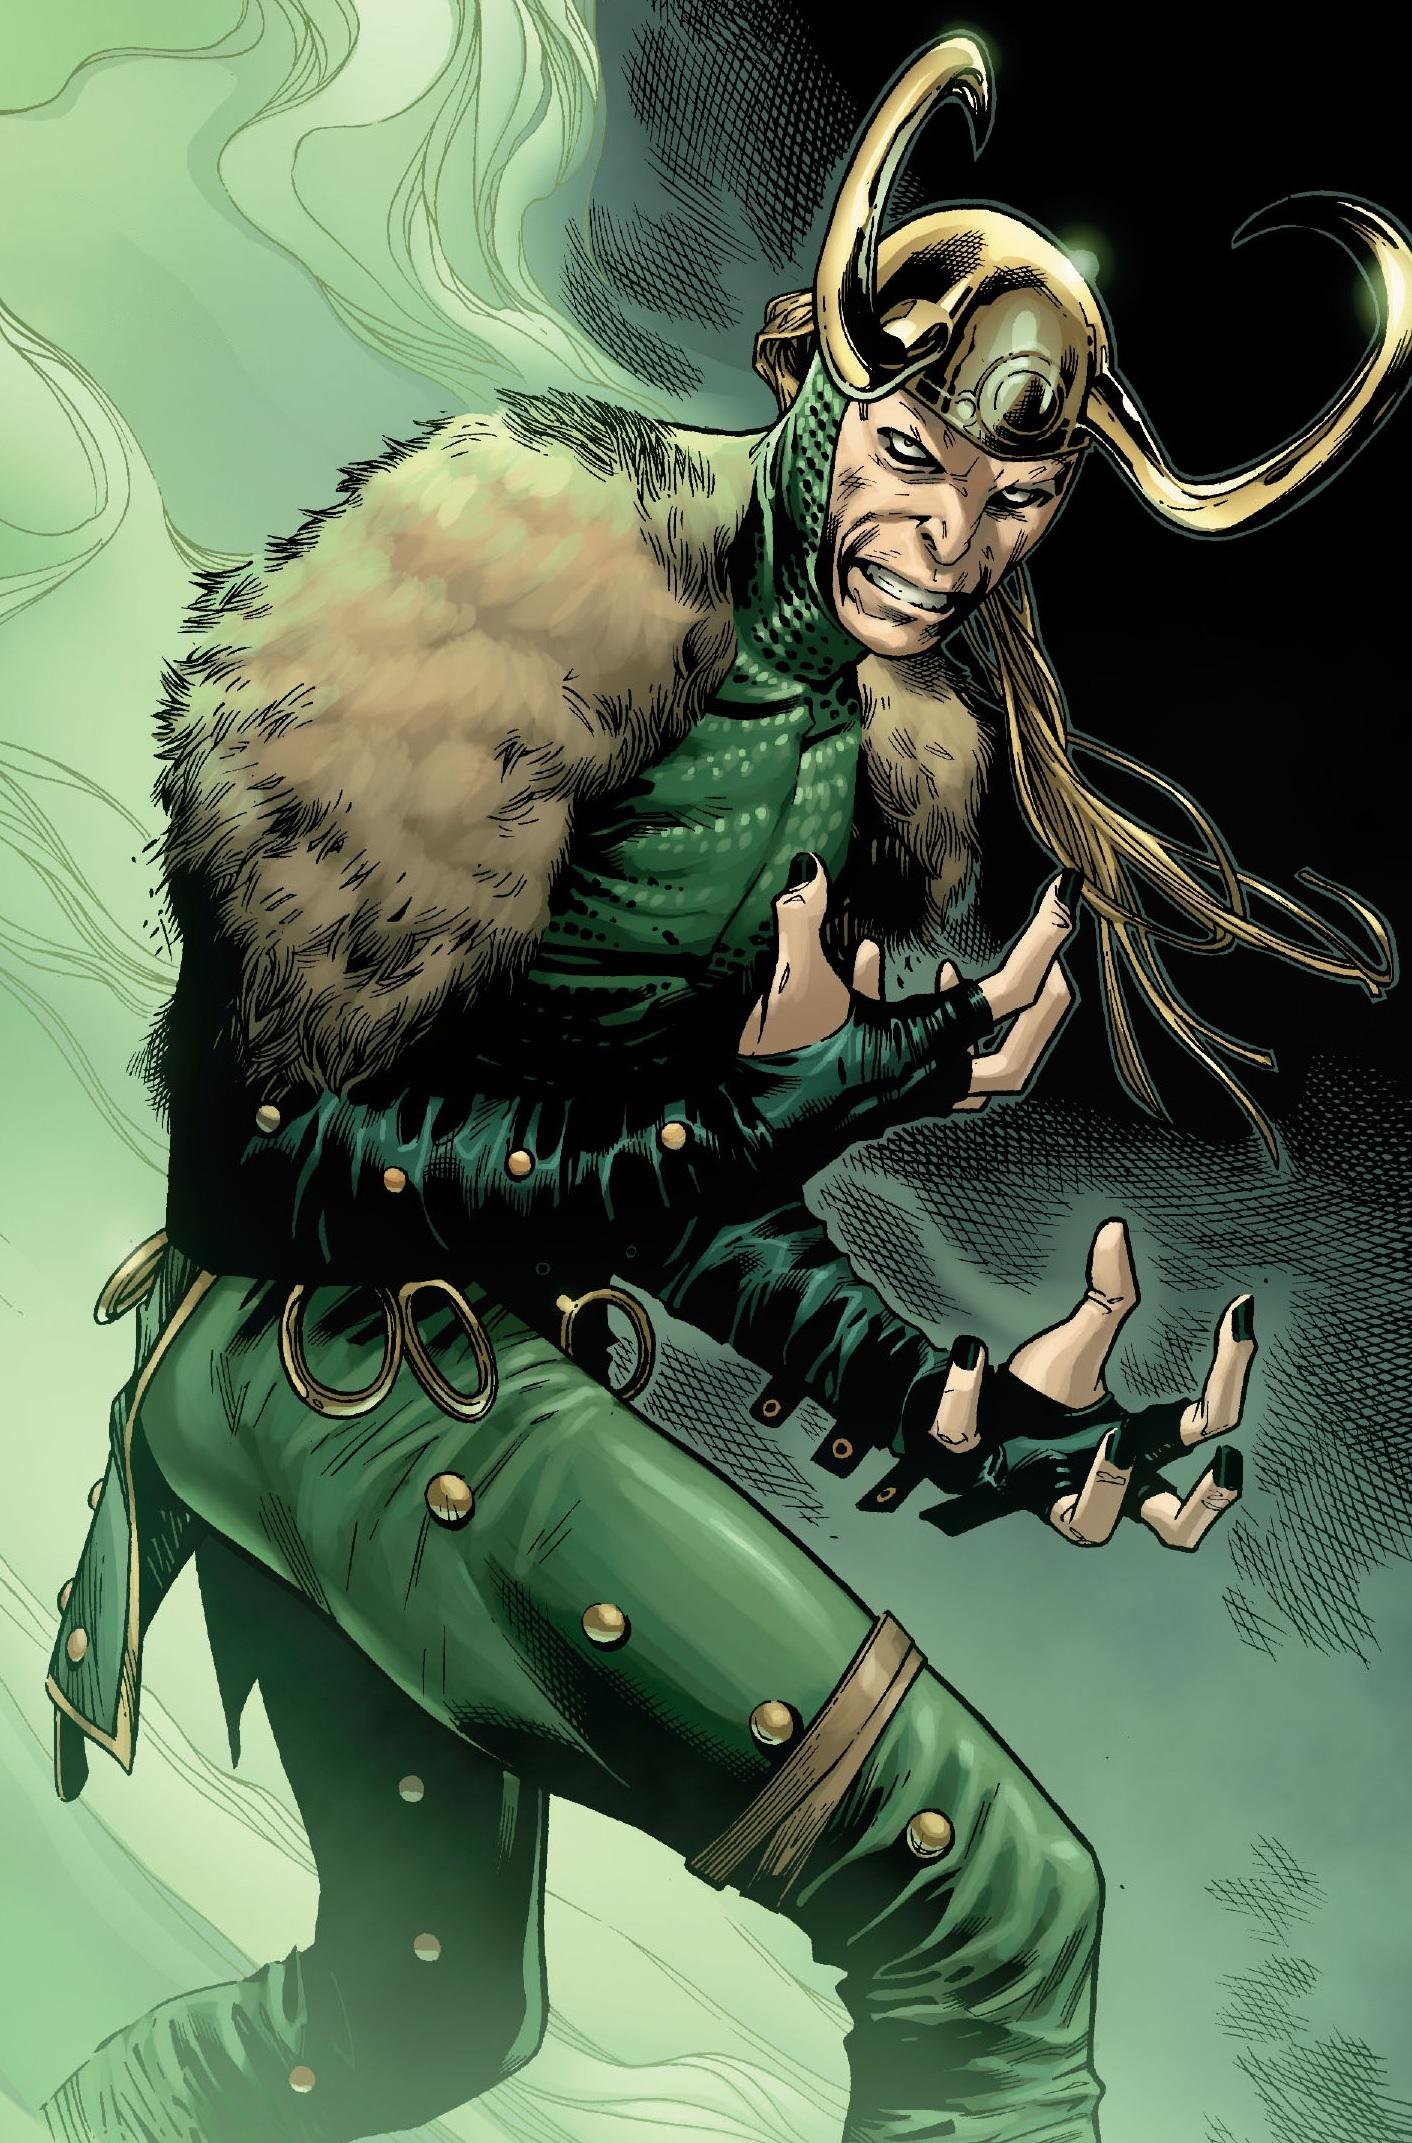 Amazing Wallpaper Marvel Loki - latest?cb\u003d20101120182453  Image_371956.jpg/revision/latest?cb\u003d20101120182453